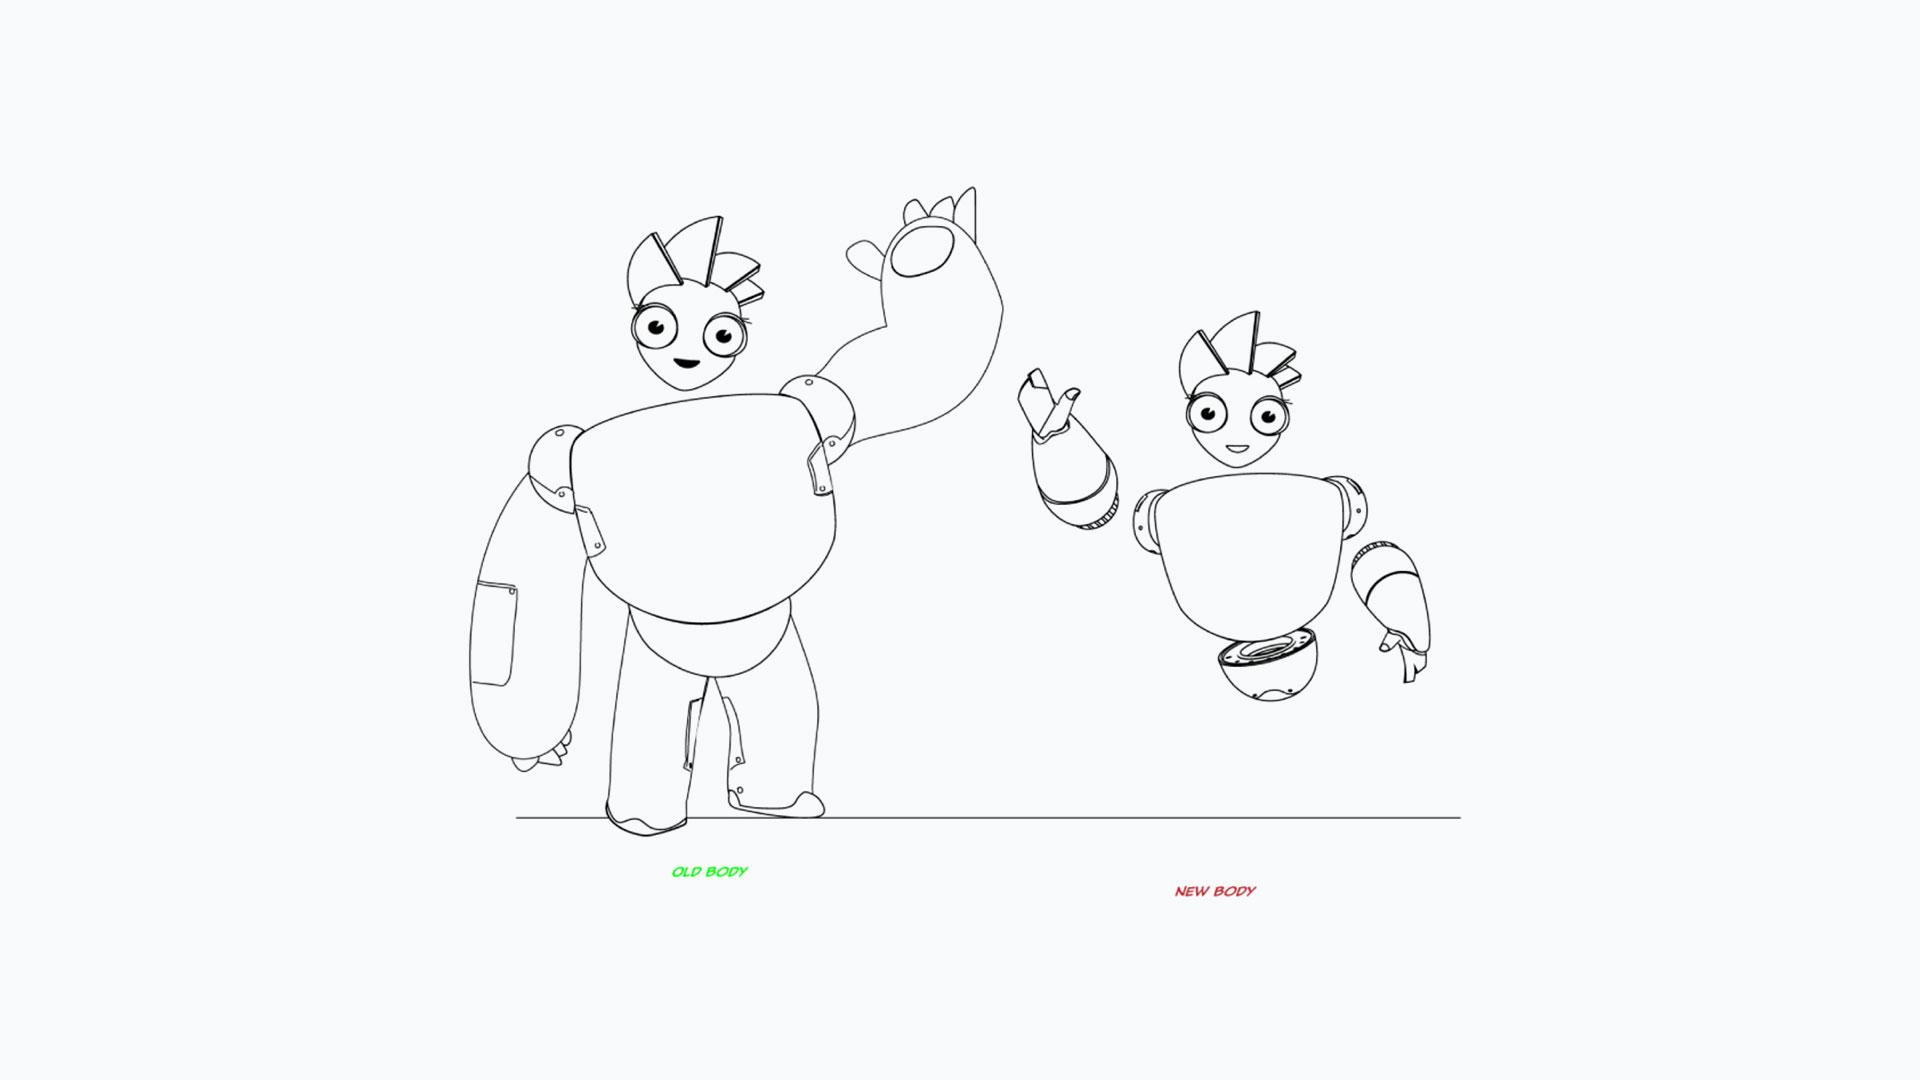 visme brand mascot - design process